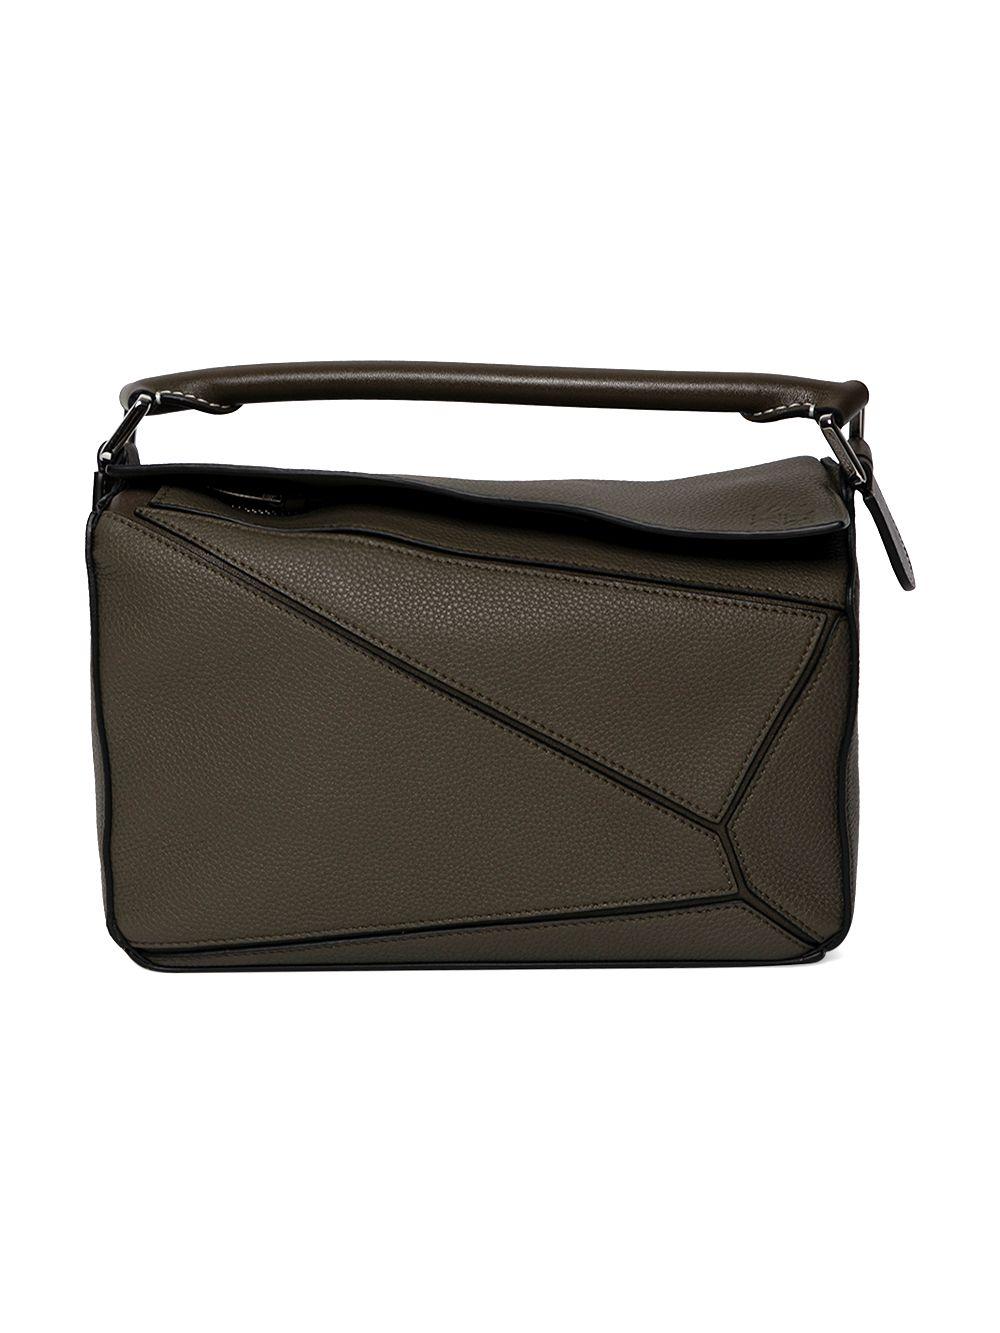 Leather Puzzle Shoulder Bag